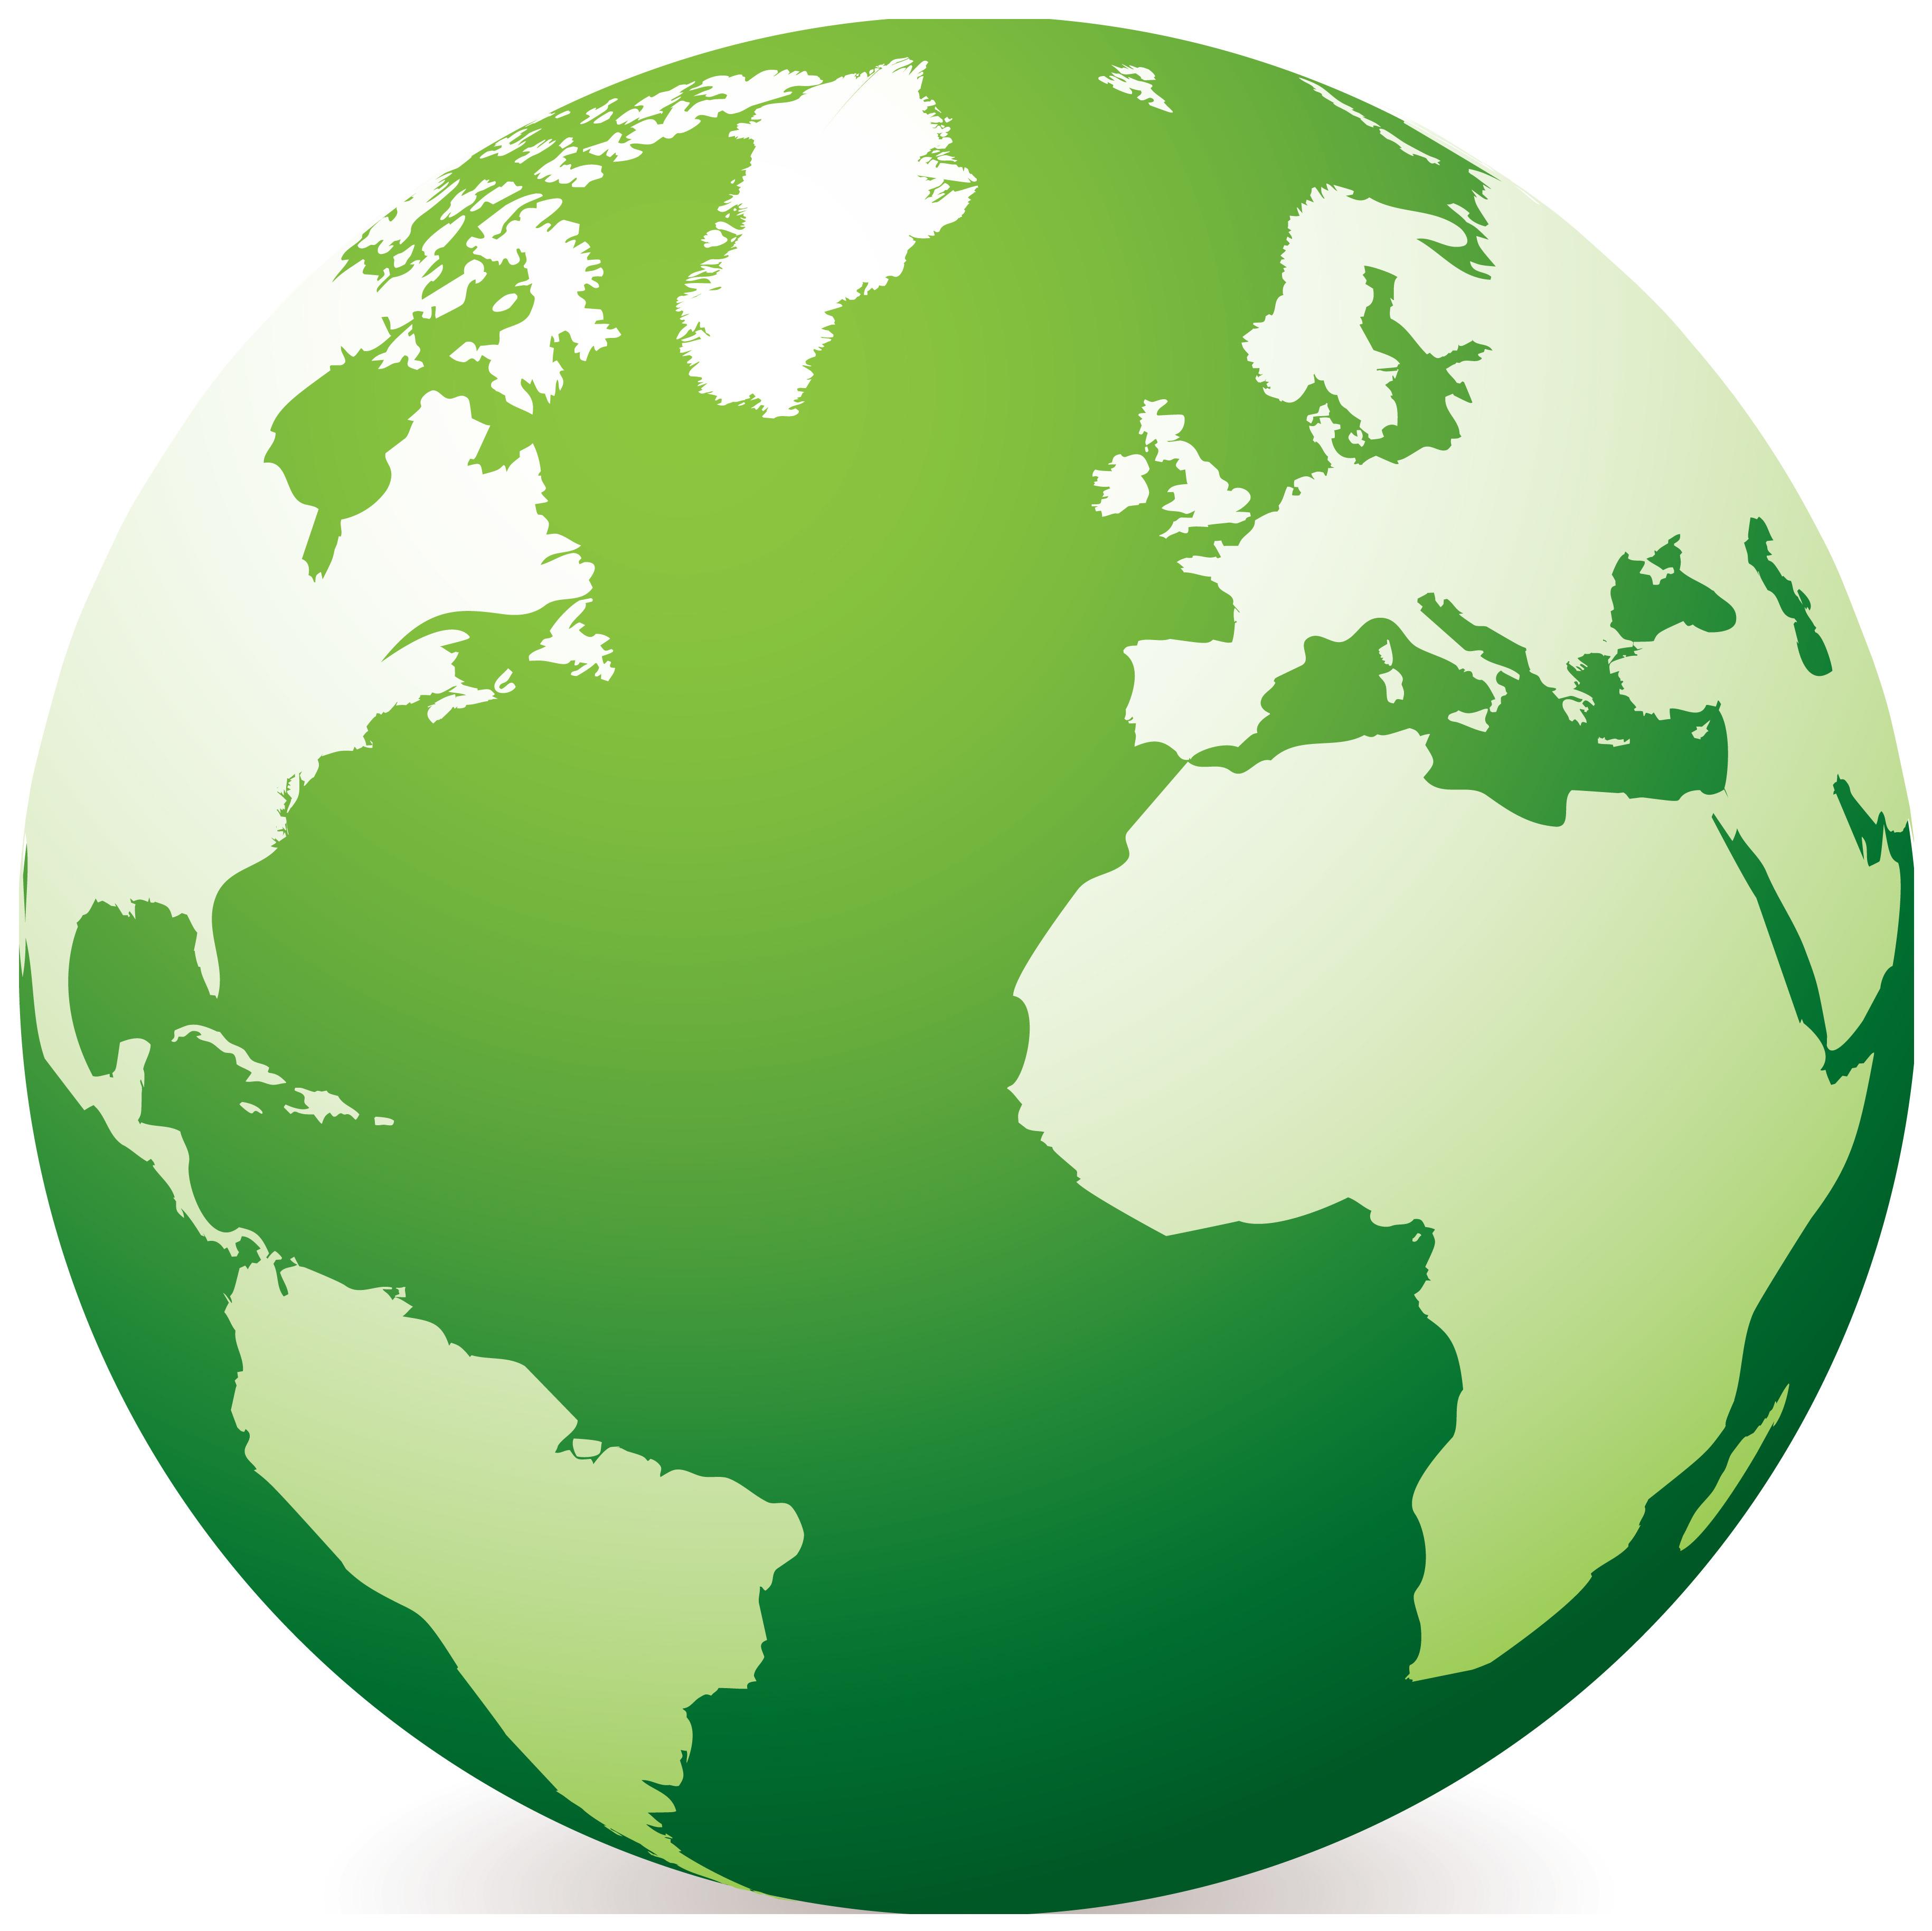 idm-globe